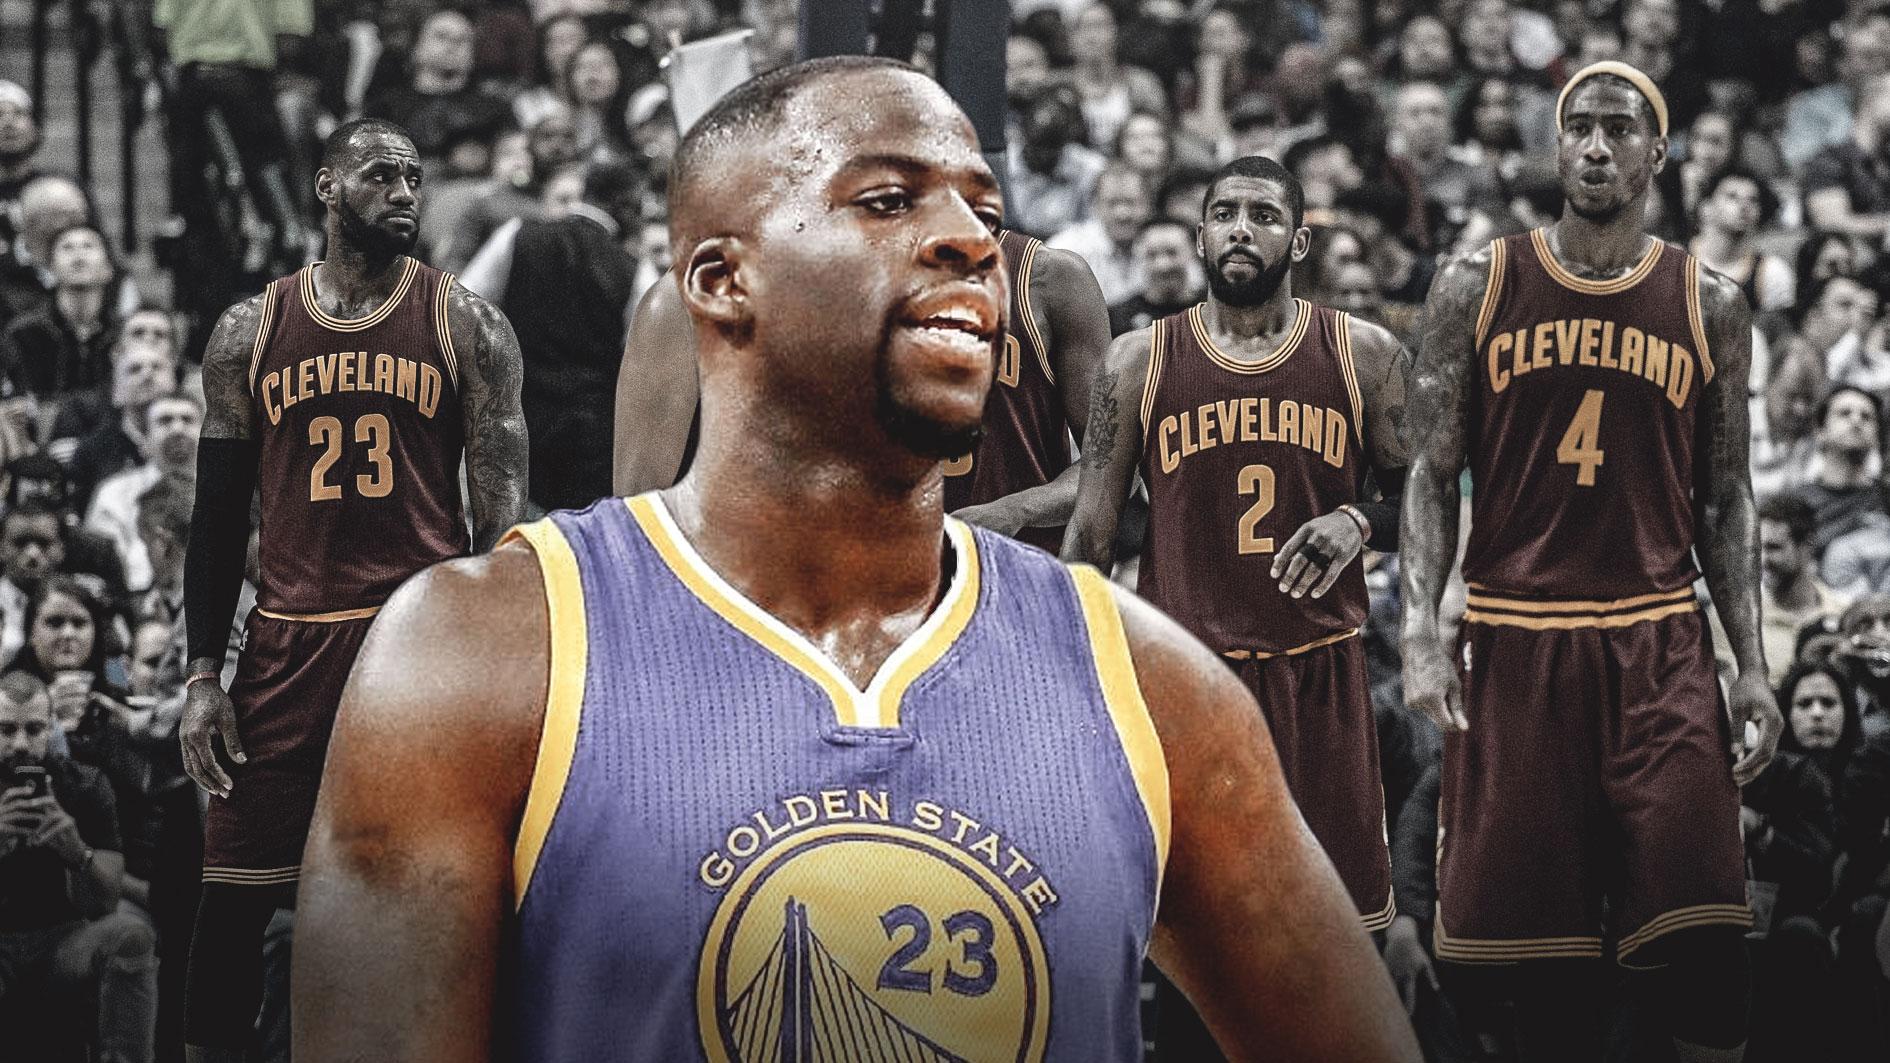 Golden State Warriors, Cleveland Cavaliers meet in Finals rematch